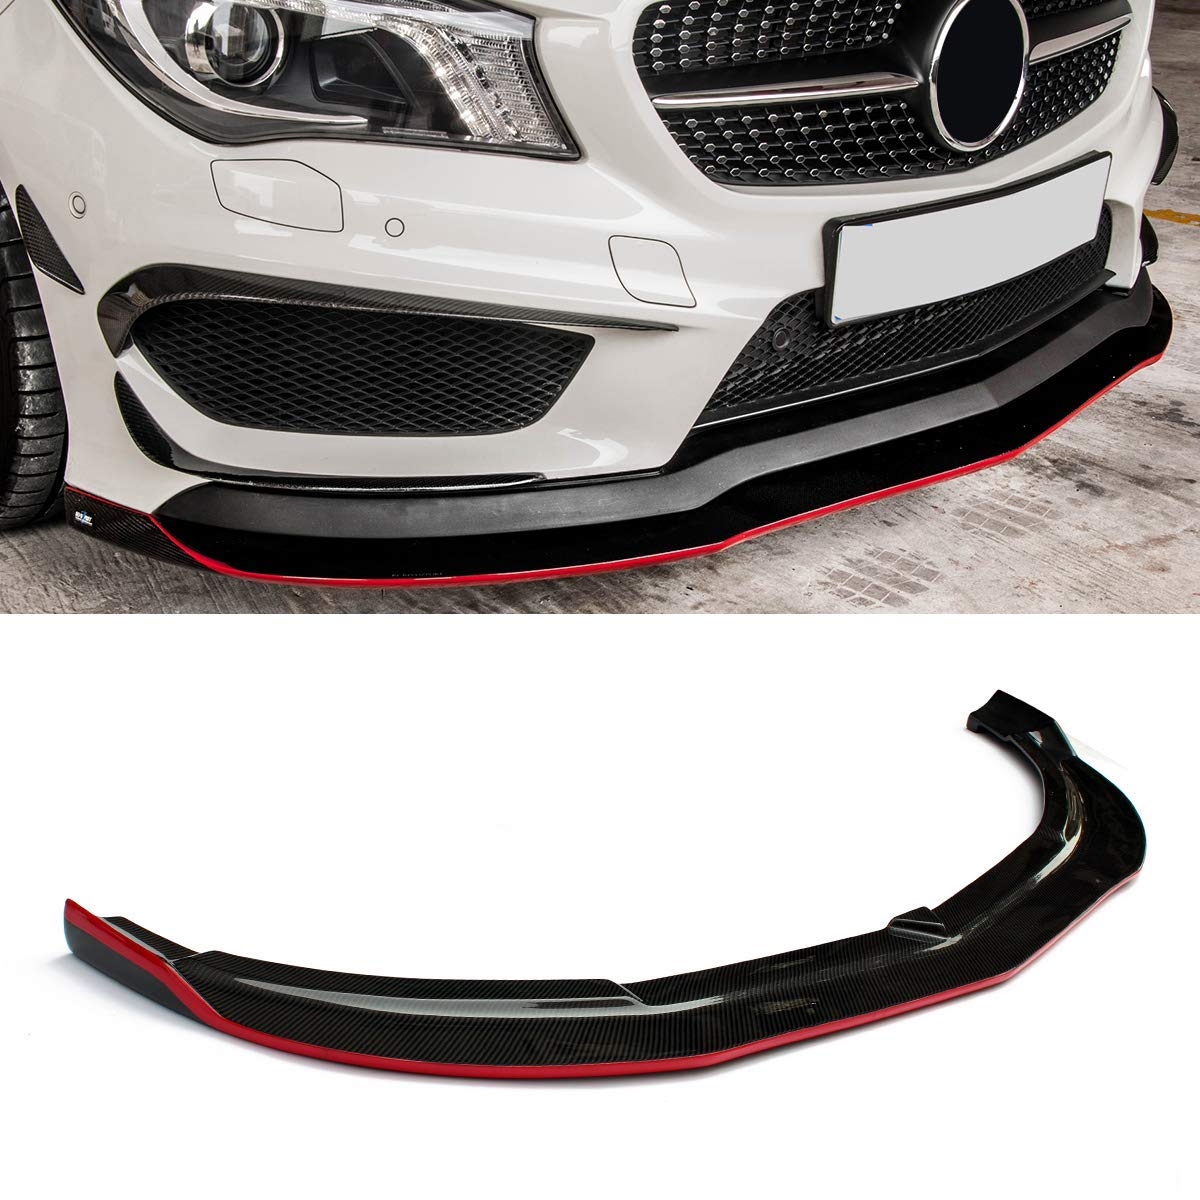 Carbon Fiber RZ Style Front Lip for Mercedes Benz CLA Class W117 Sport Edition /& CLA45 2013-2015 Fandixin W117 Front Lip